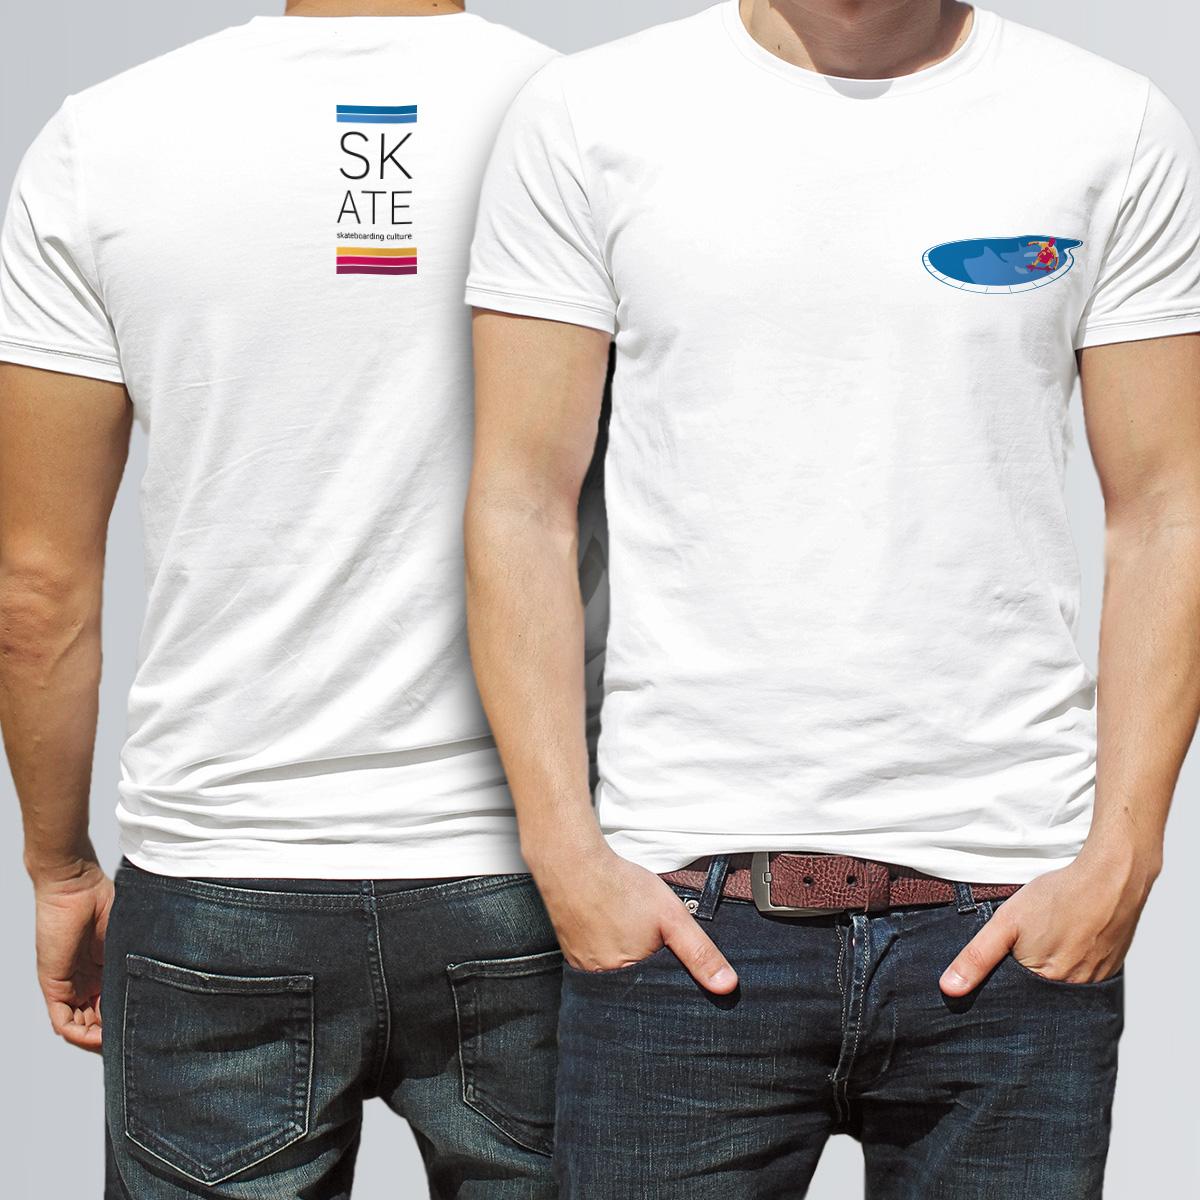 Camiseta promocional del libro SKATE